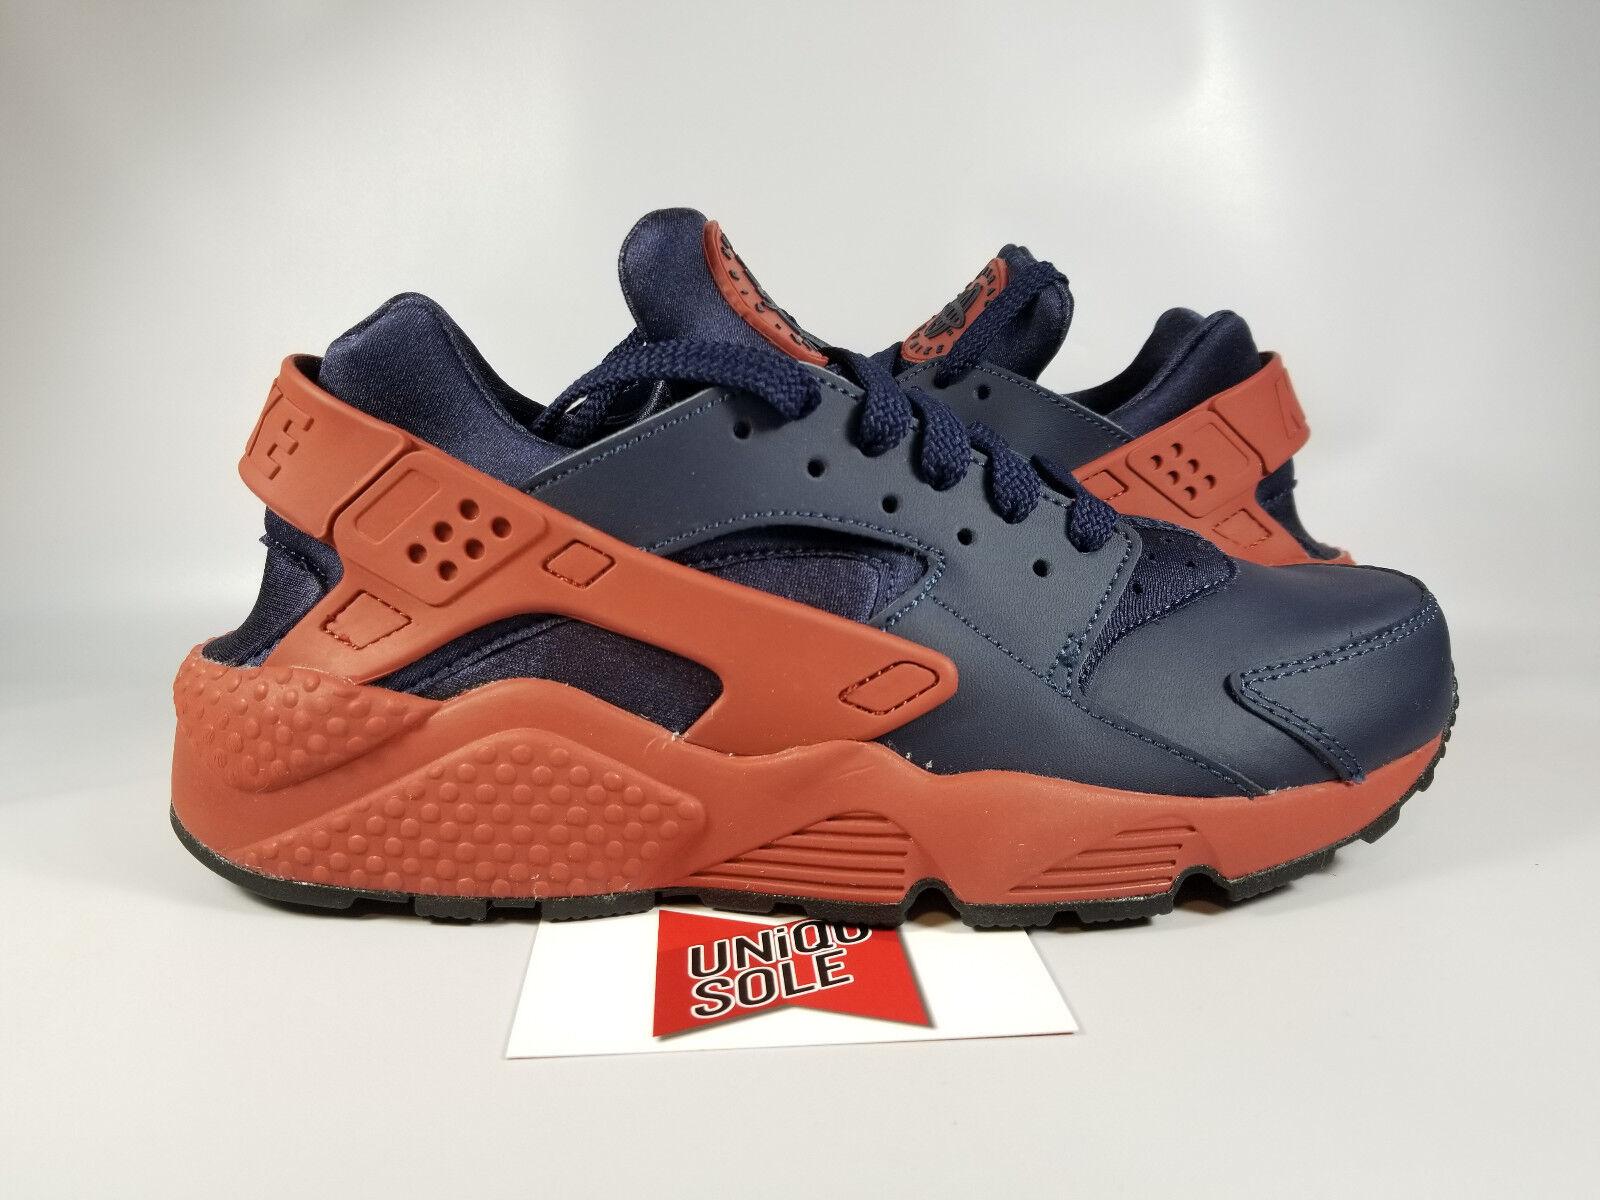 size 40 0c35e 82ef1 Nike Nike Nike Air Huarache Run WATER ON MARS SPACE PACK RED STONE OBSIDIAN  NAVY BLUE 9.5 d7575f